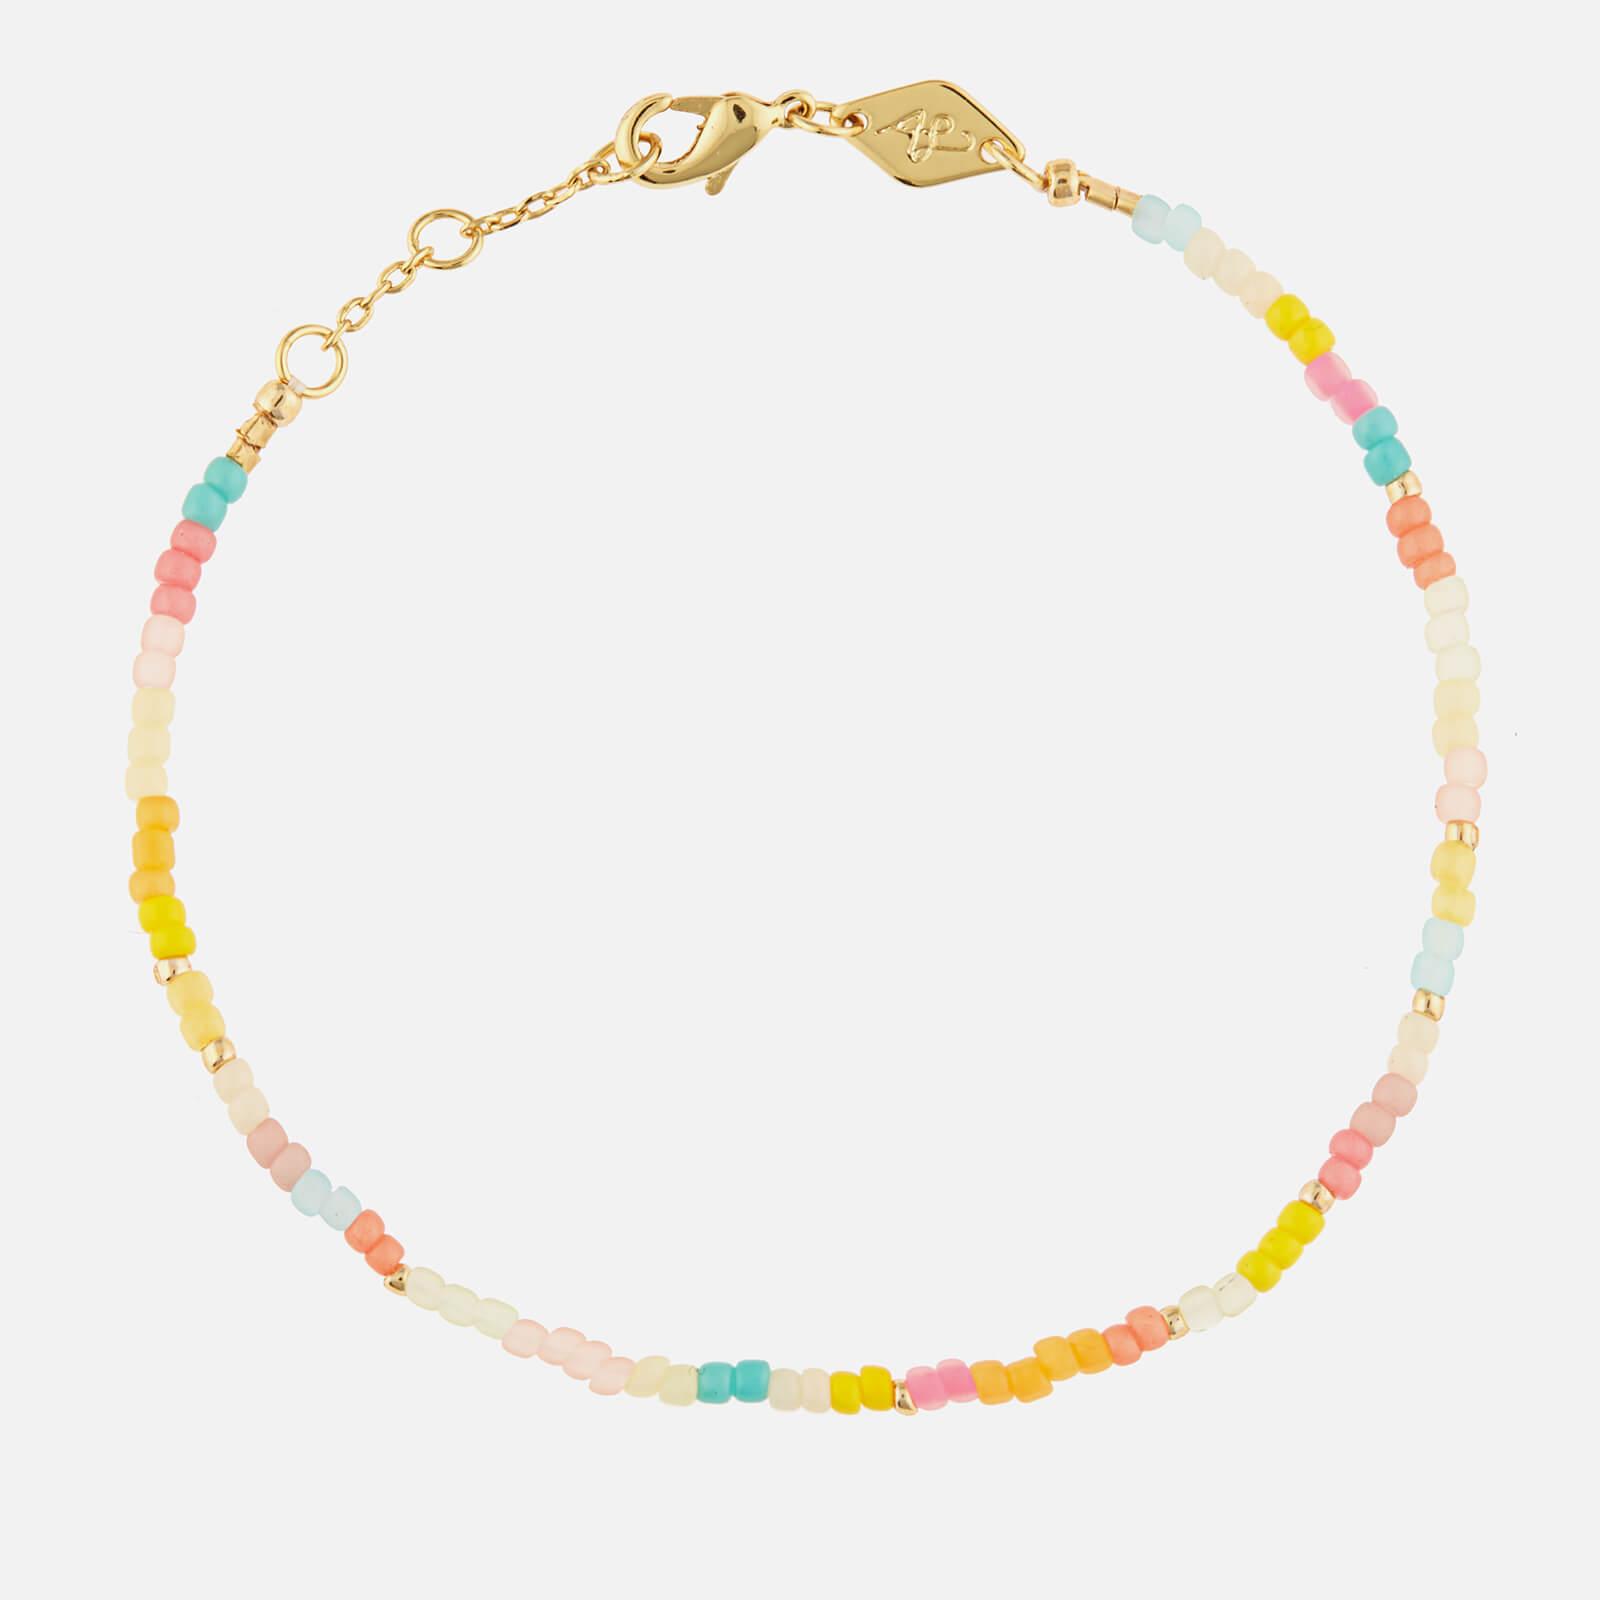 Anni Lu Women's Candy Eldorado Bracelet - Candy